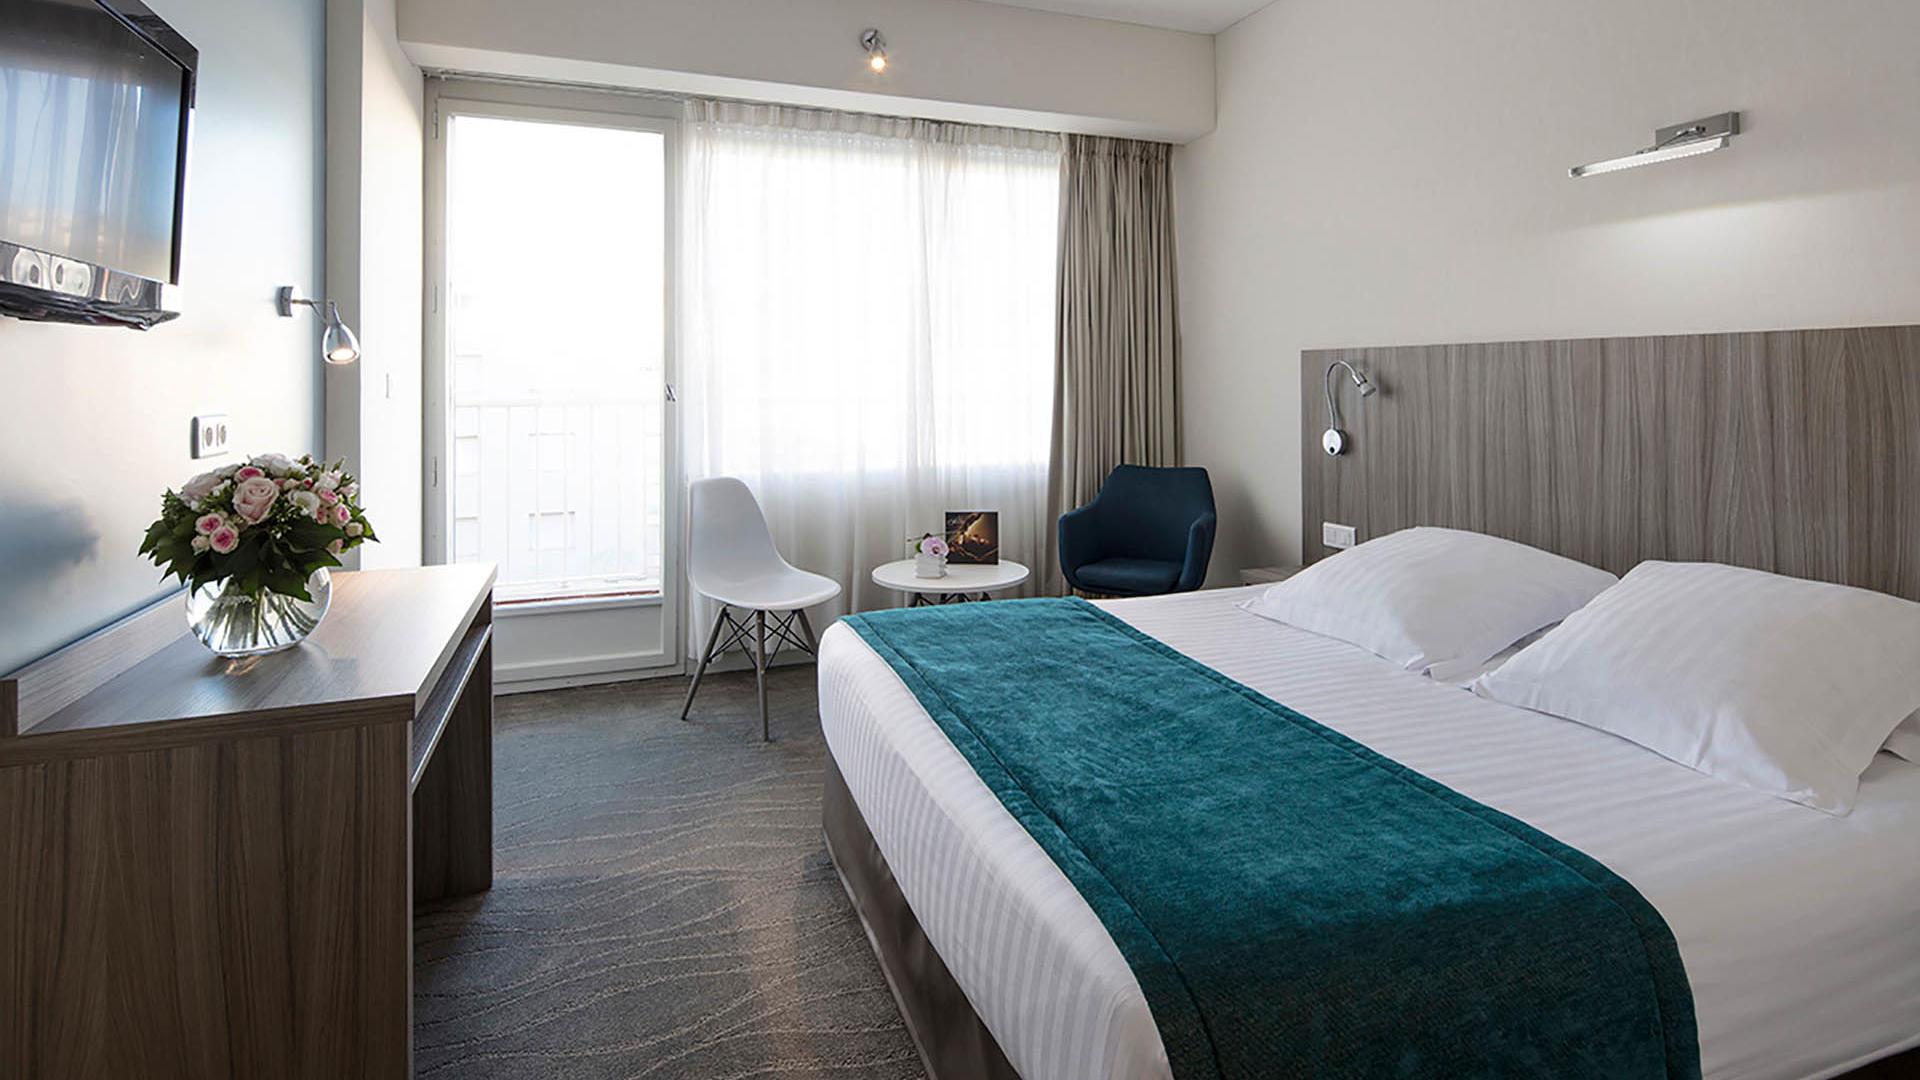 Harmonie Room at Spleandid Hotel and Spa